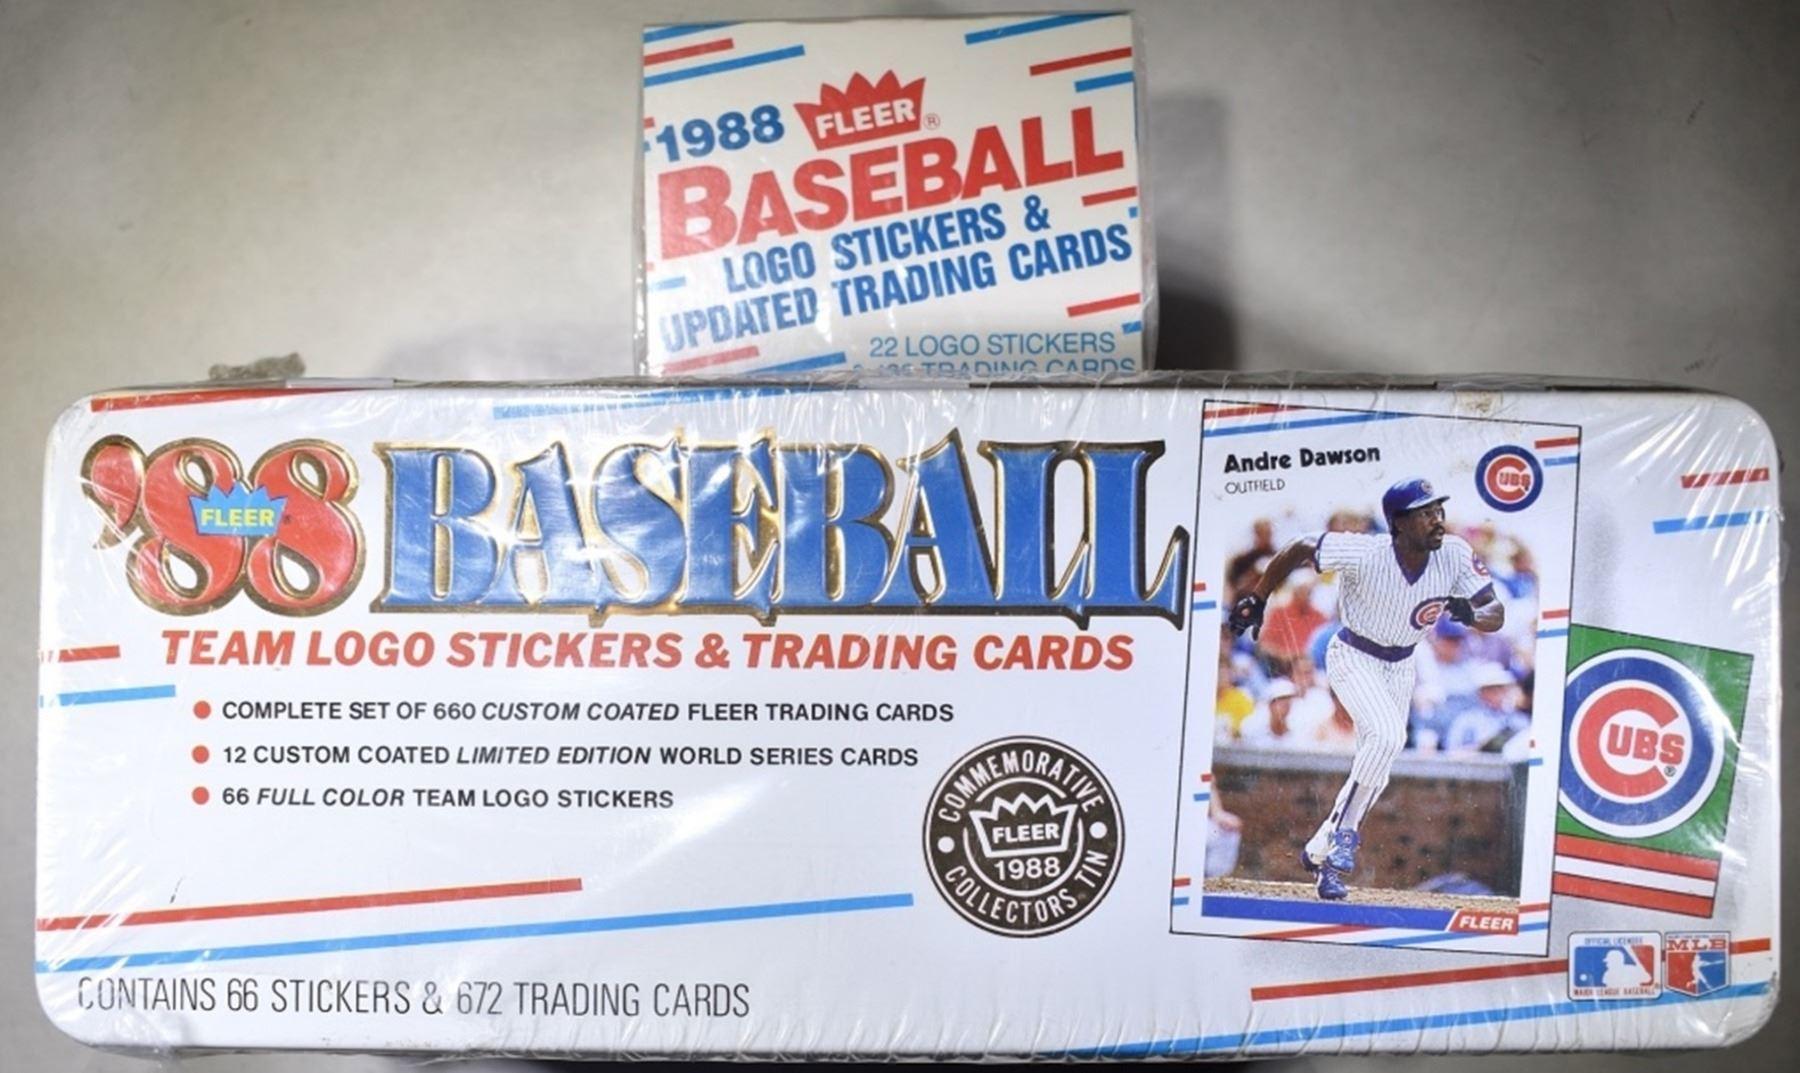 2 1988 Baseball Logo Stickers